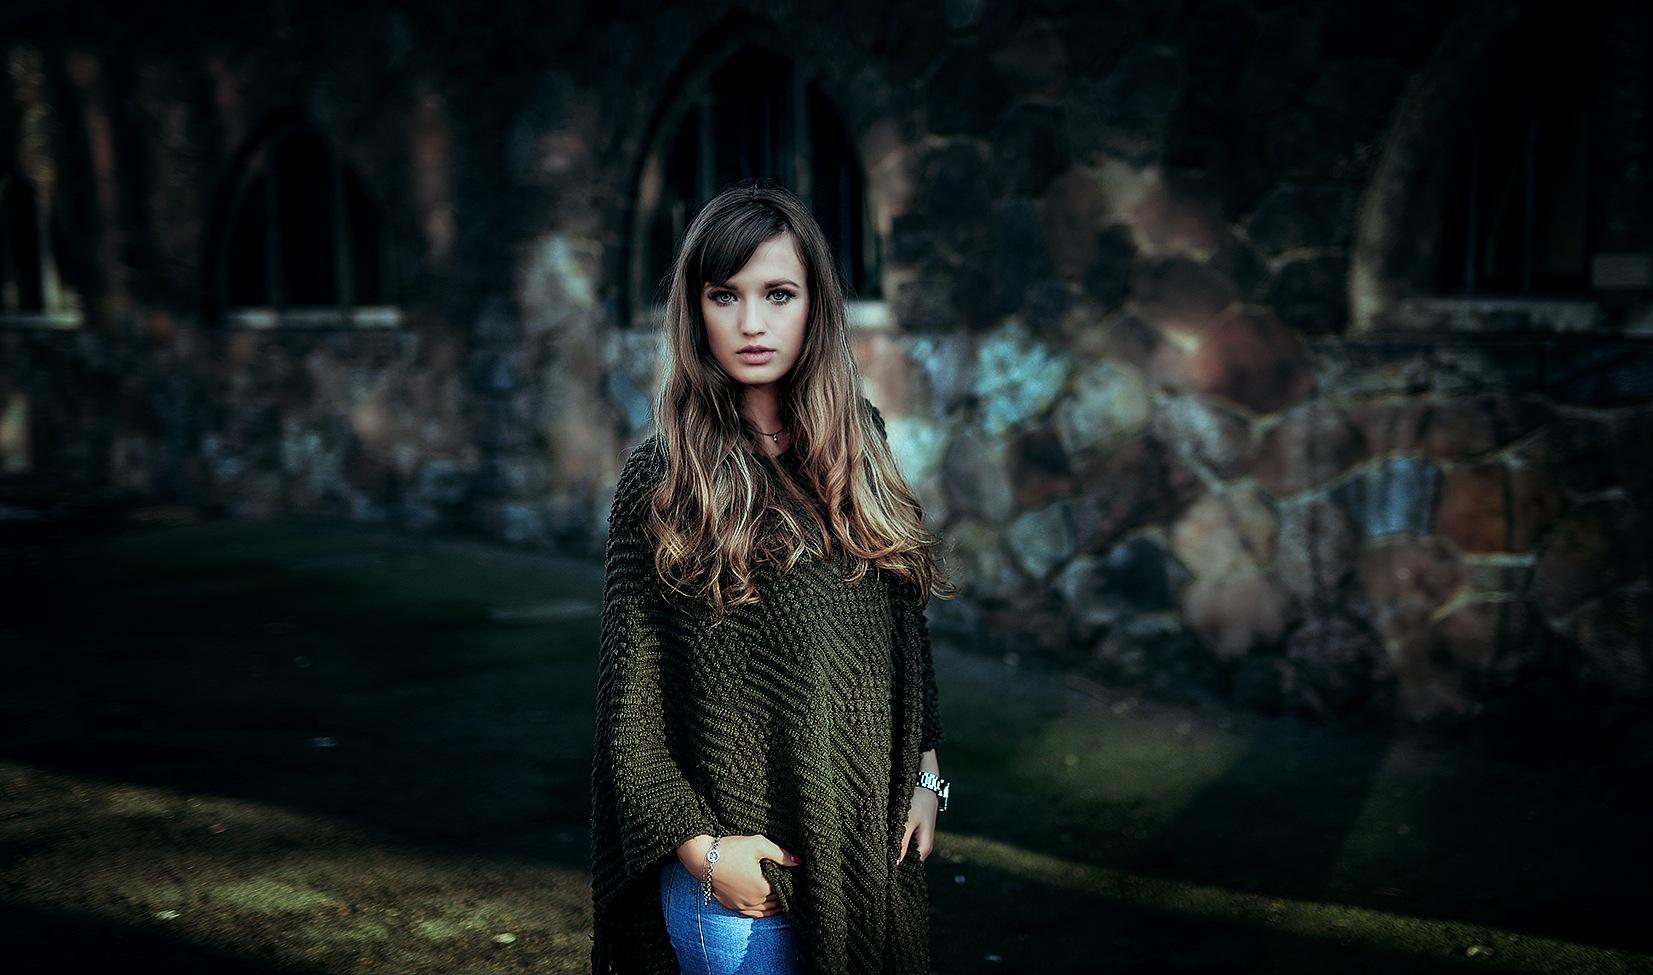 Walk with me... by Melan Cholia